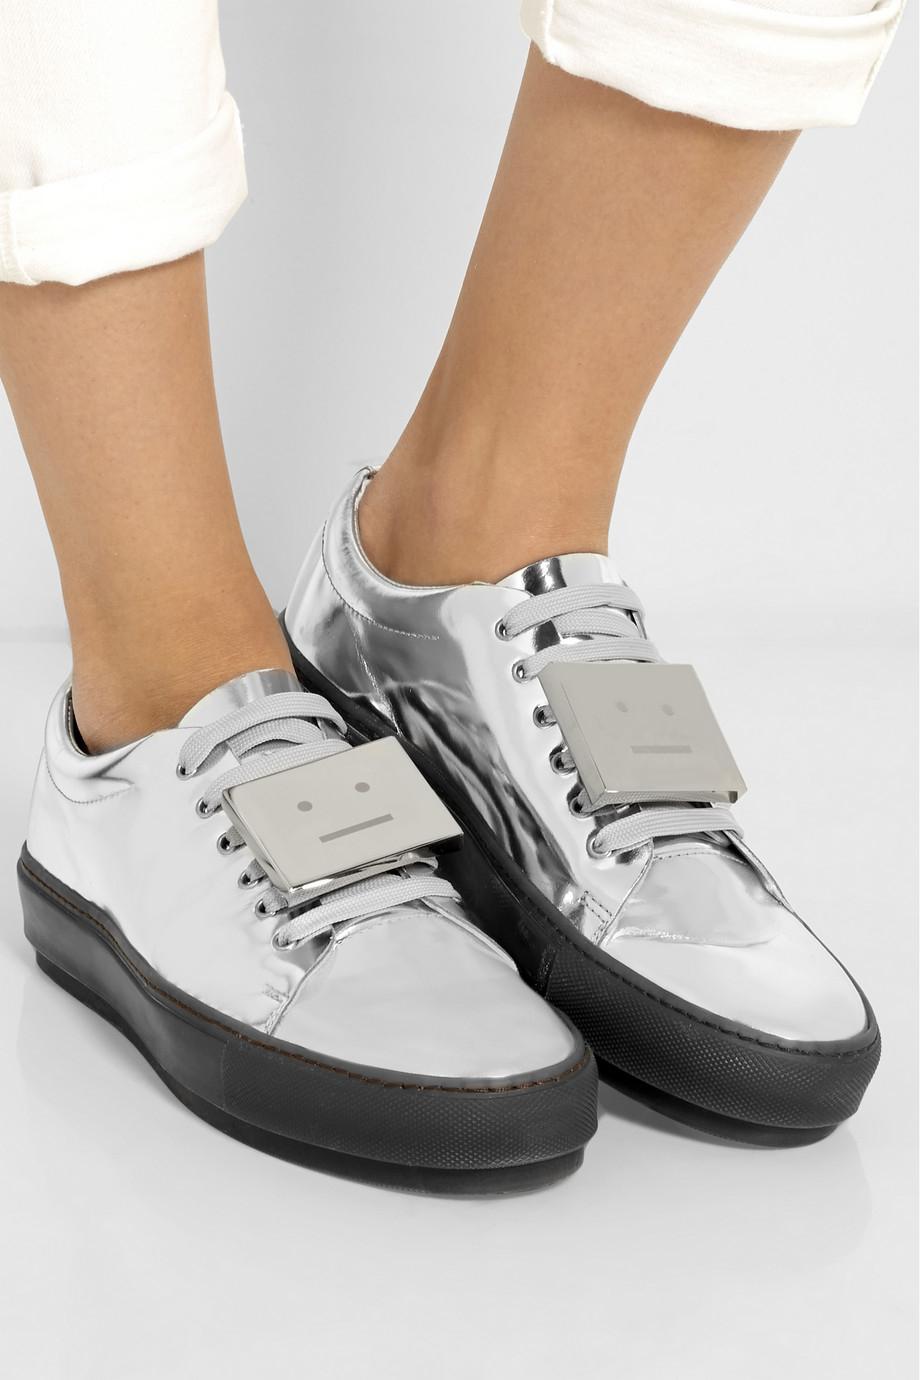 Acne Studios Shoes Uk